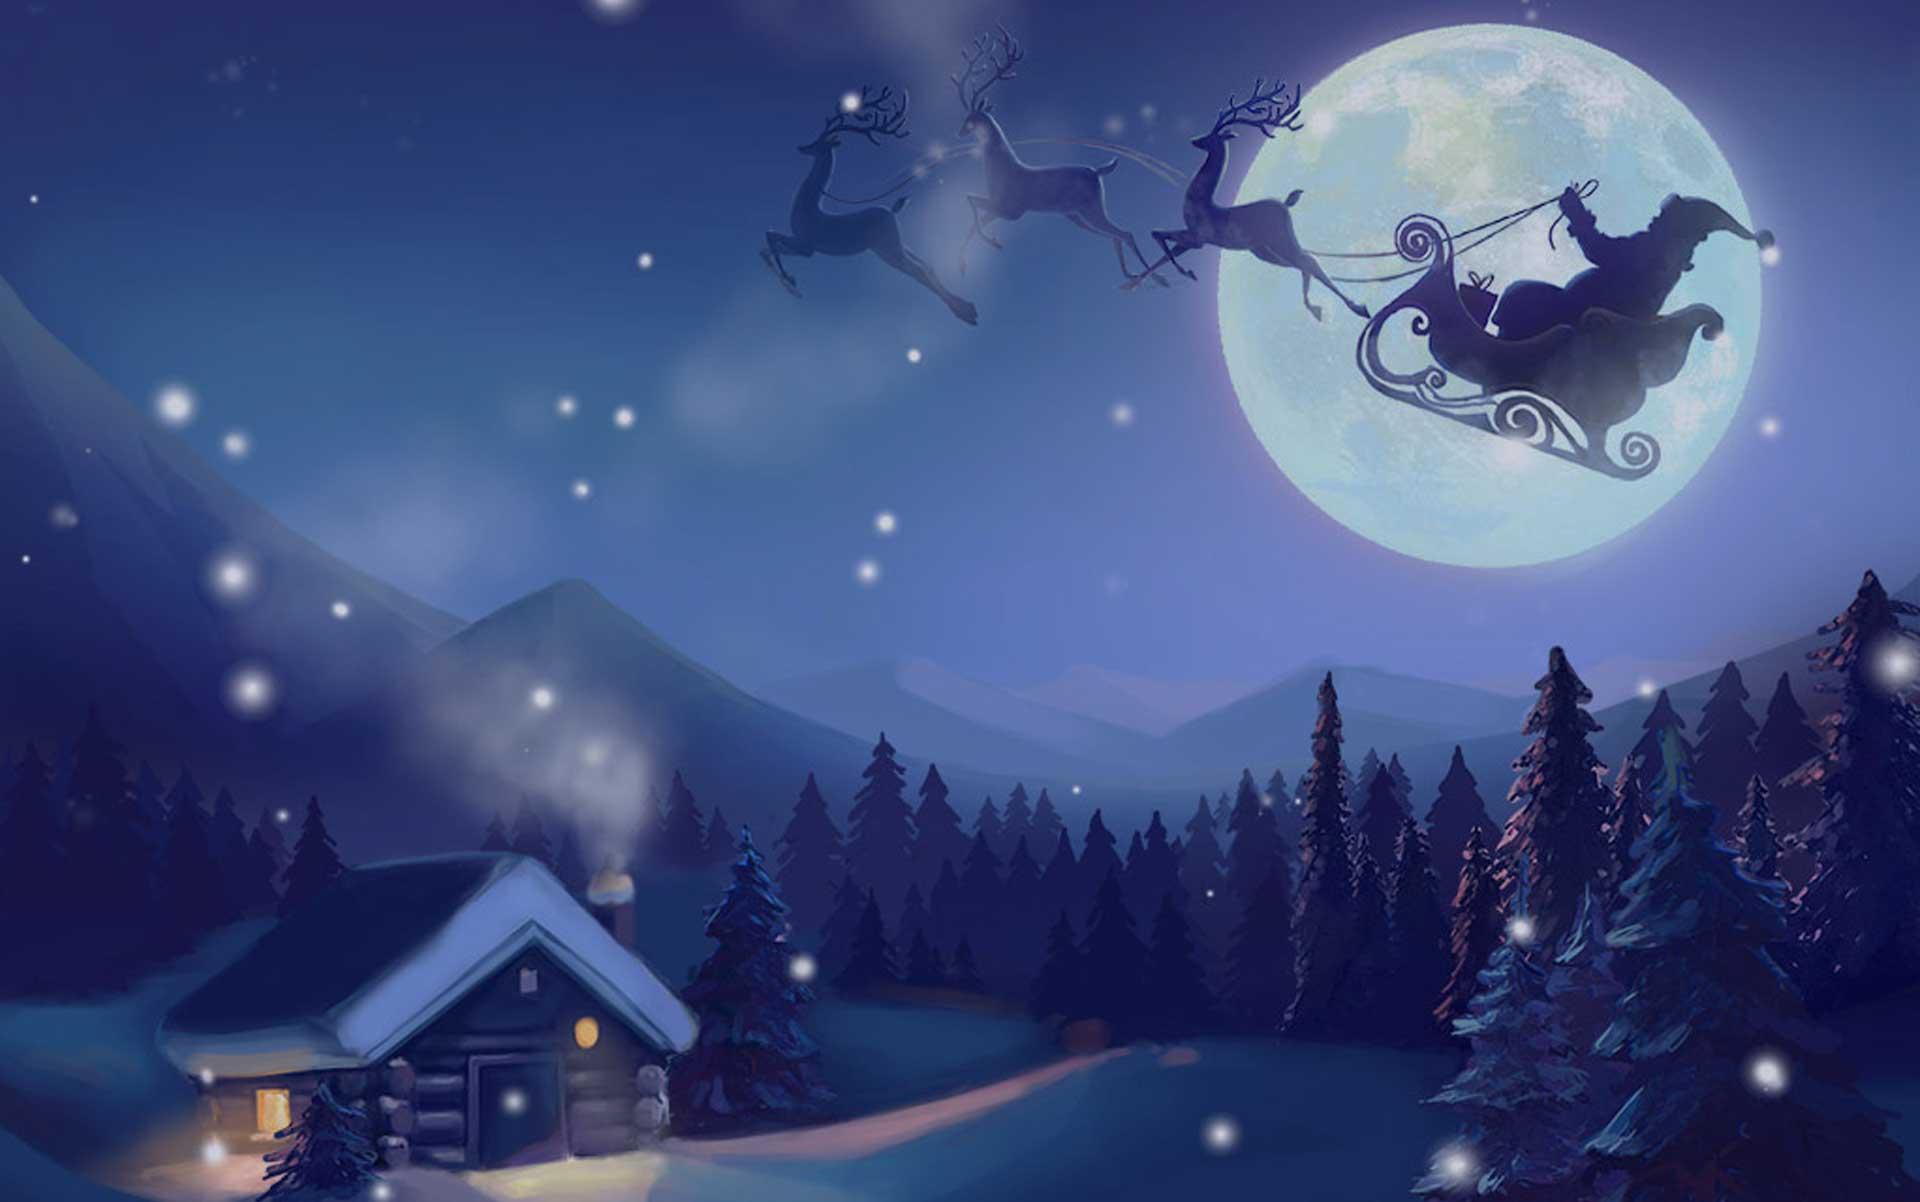 Christmas 2017_Solitaire Jack Frost Winter Adventures 2